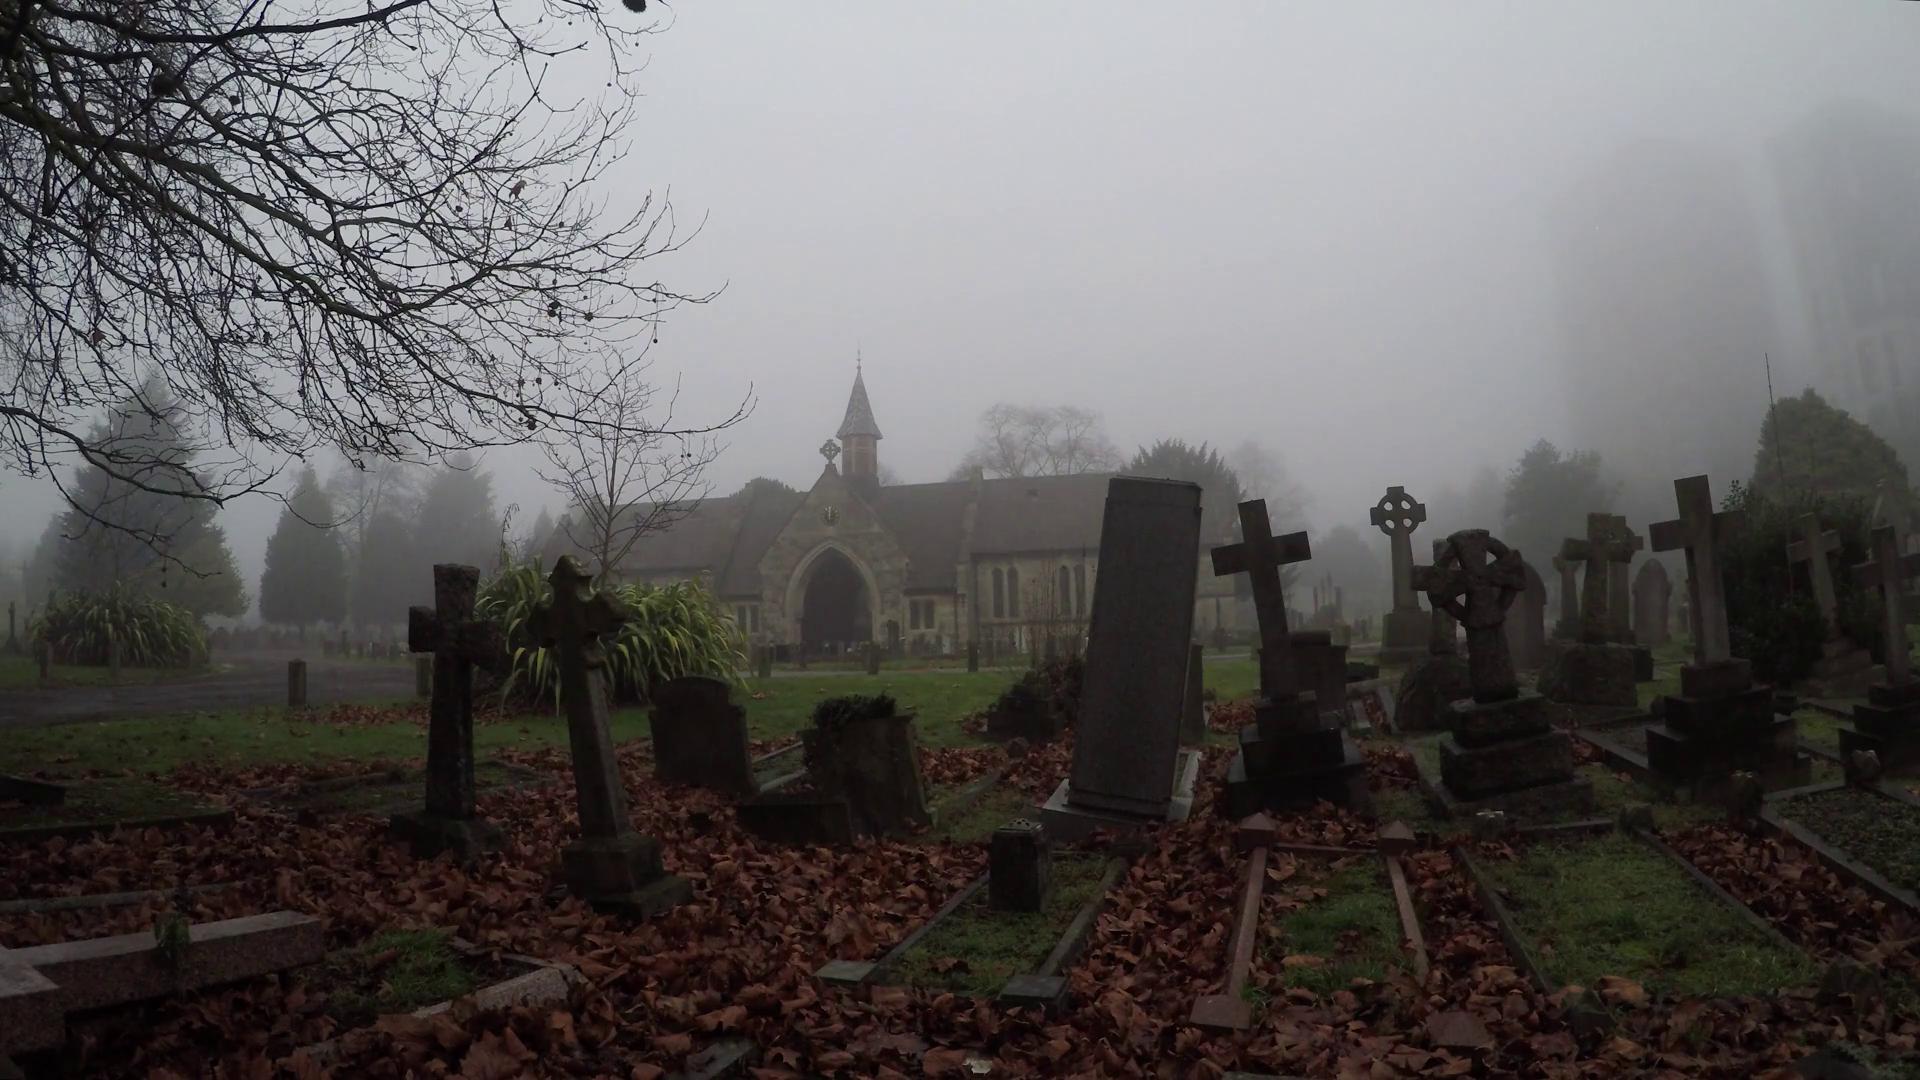 Unmarked gravestones at graveyard 4k Stock Video Footage - VideoBlocks